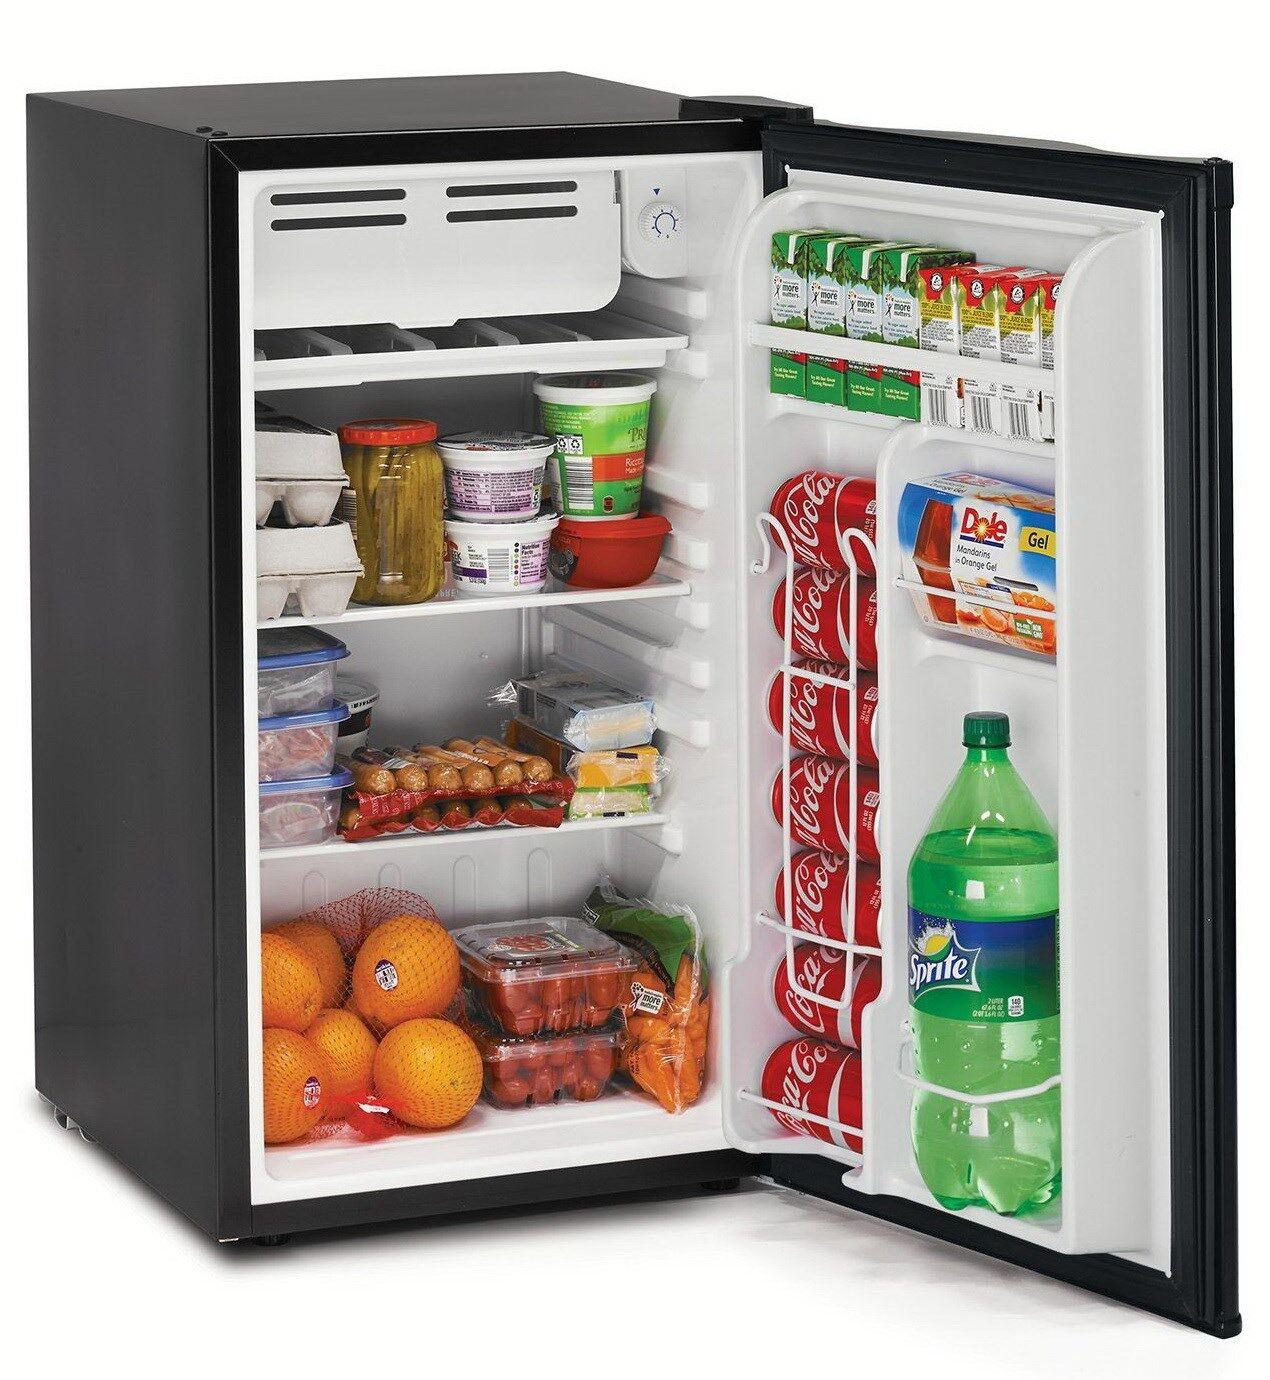 new tramontina 3 2 cu ft compact refrigerator small dorm office fridge ebay. Black Bedroom Furniture Sets. Home Design Ideas